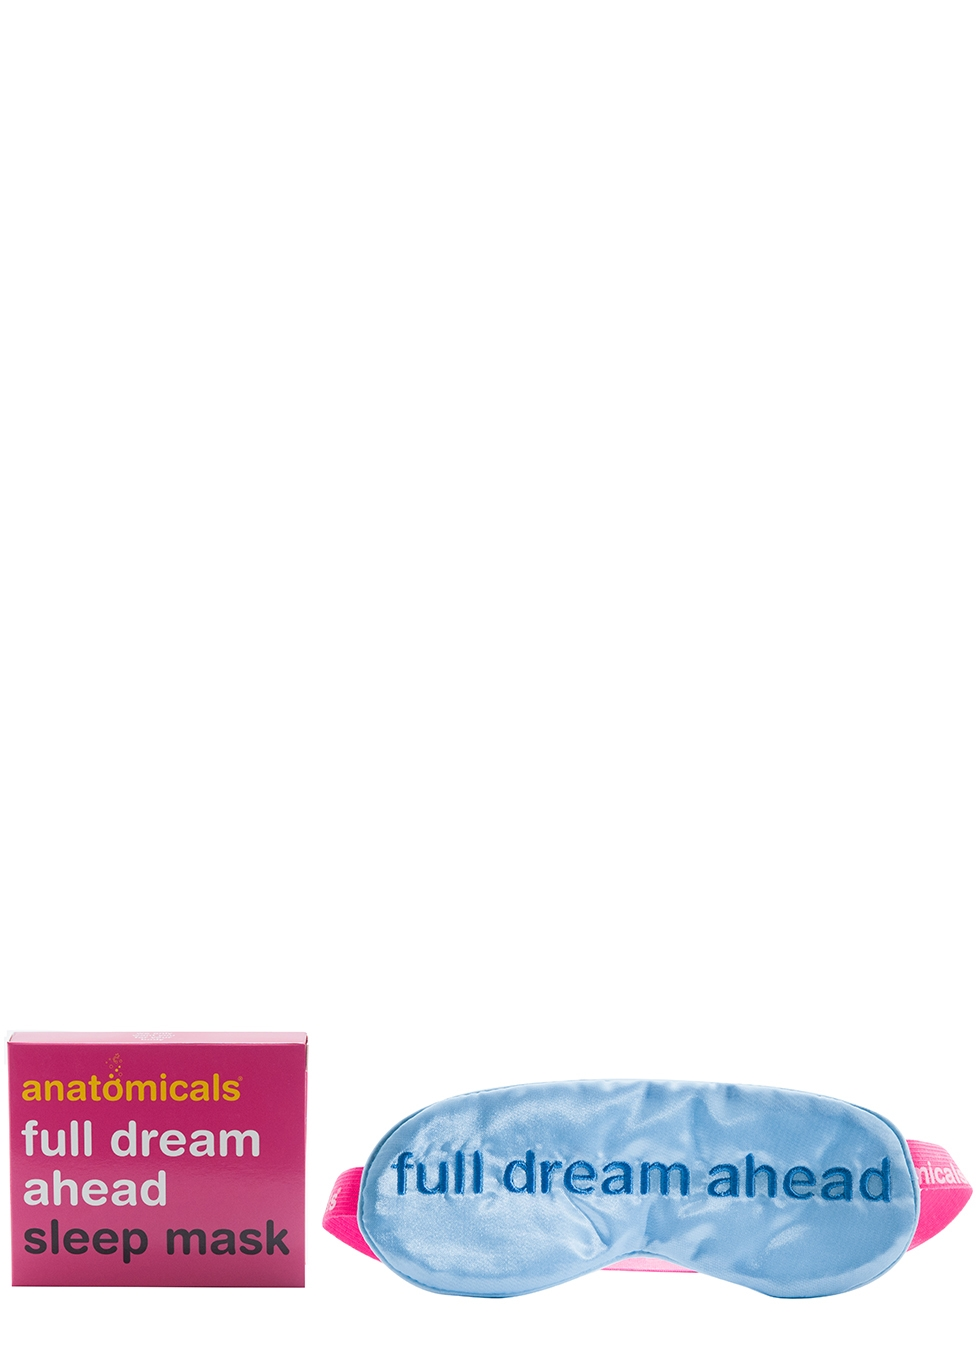 Full Dream Ahead Sleep Mask